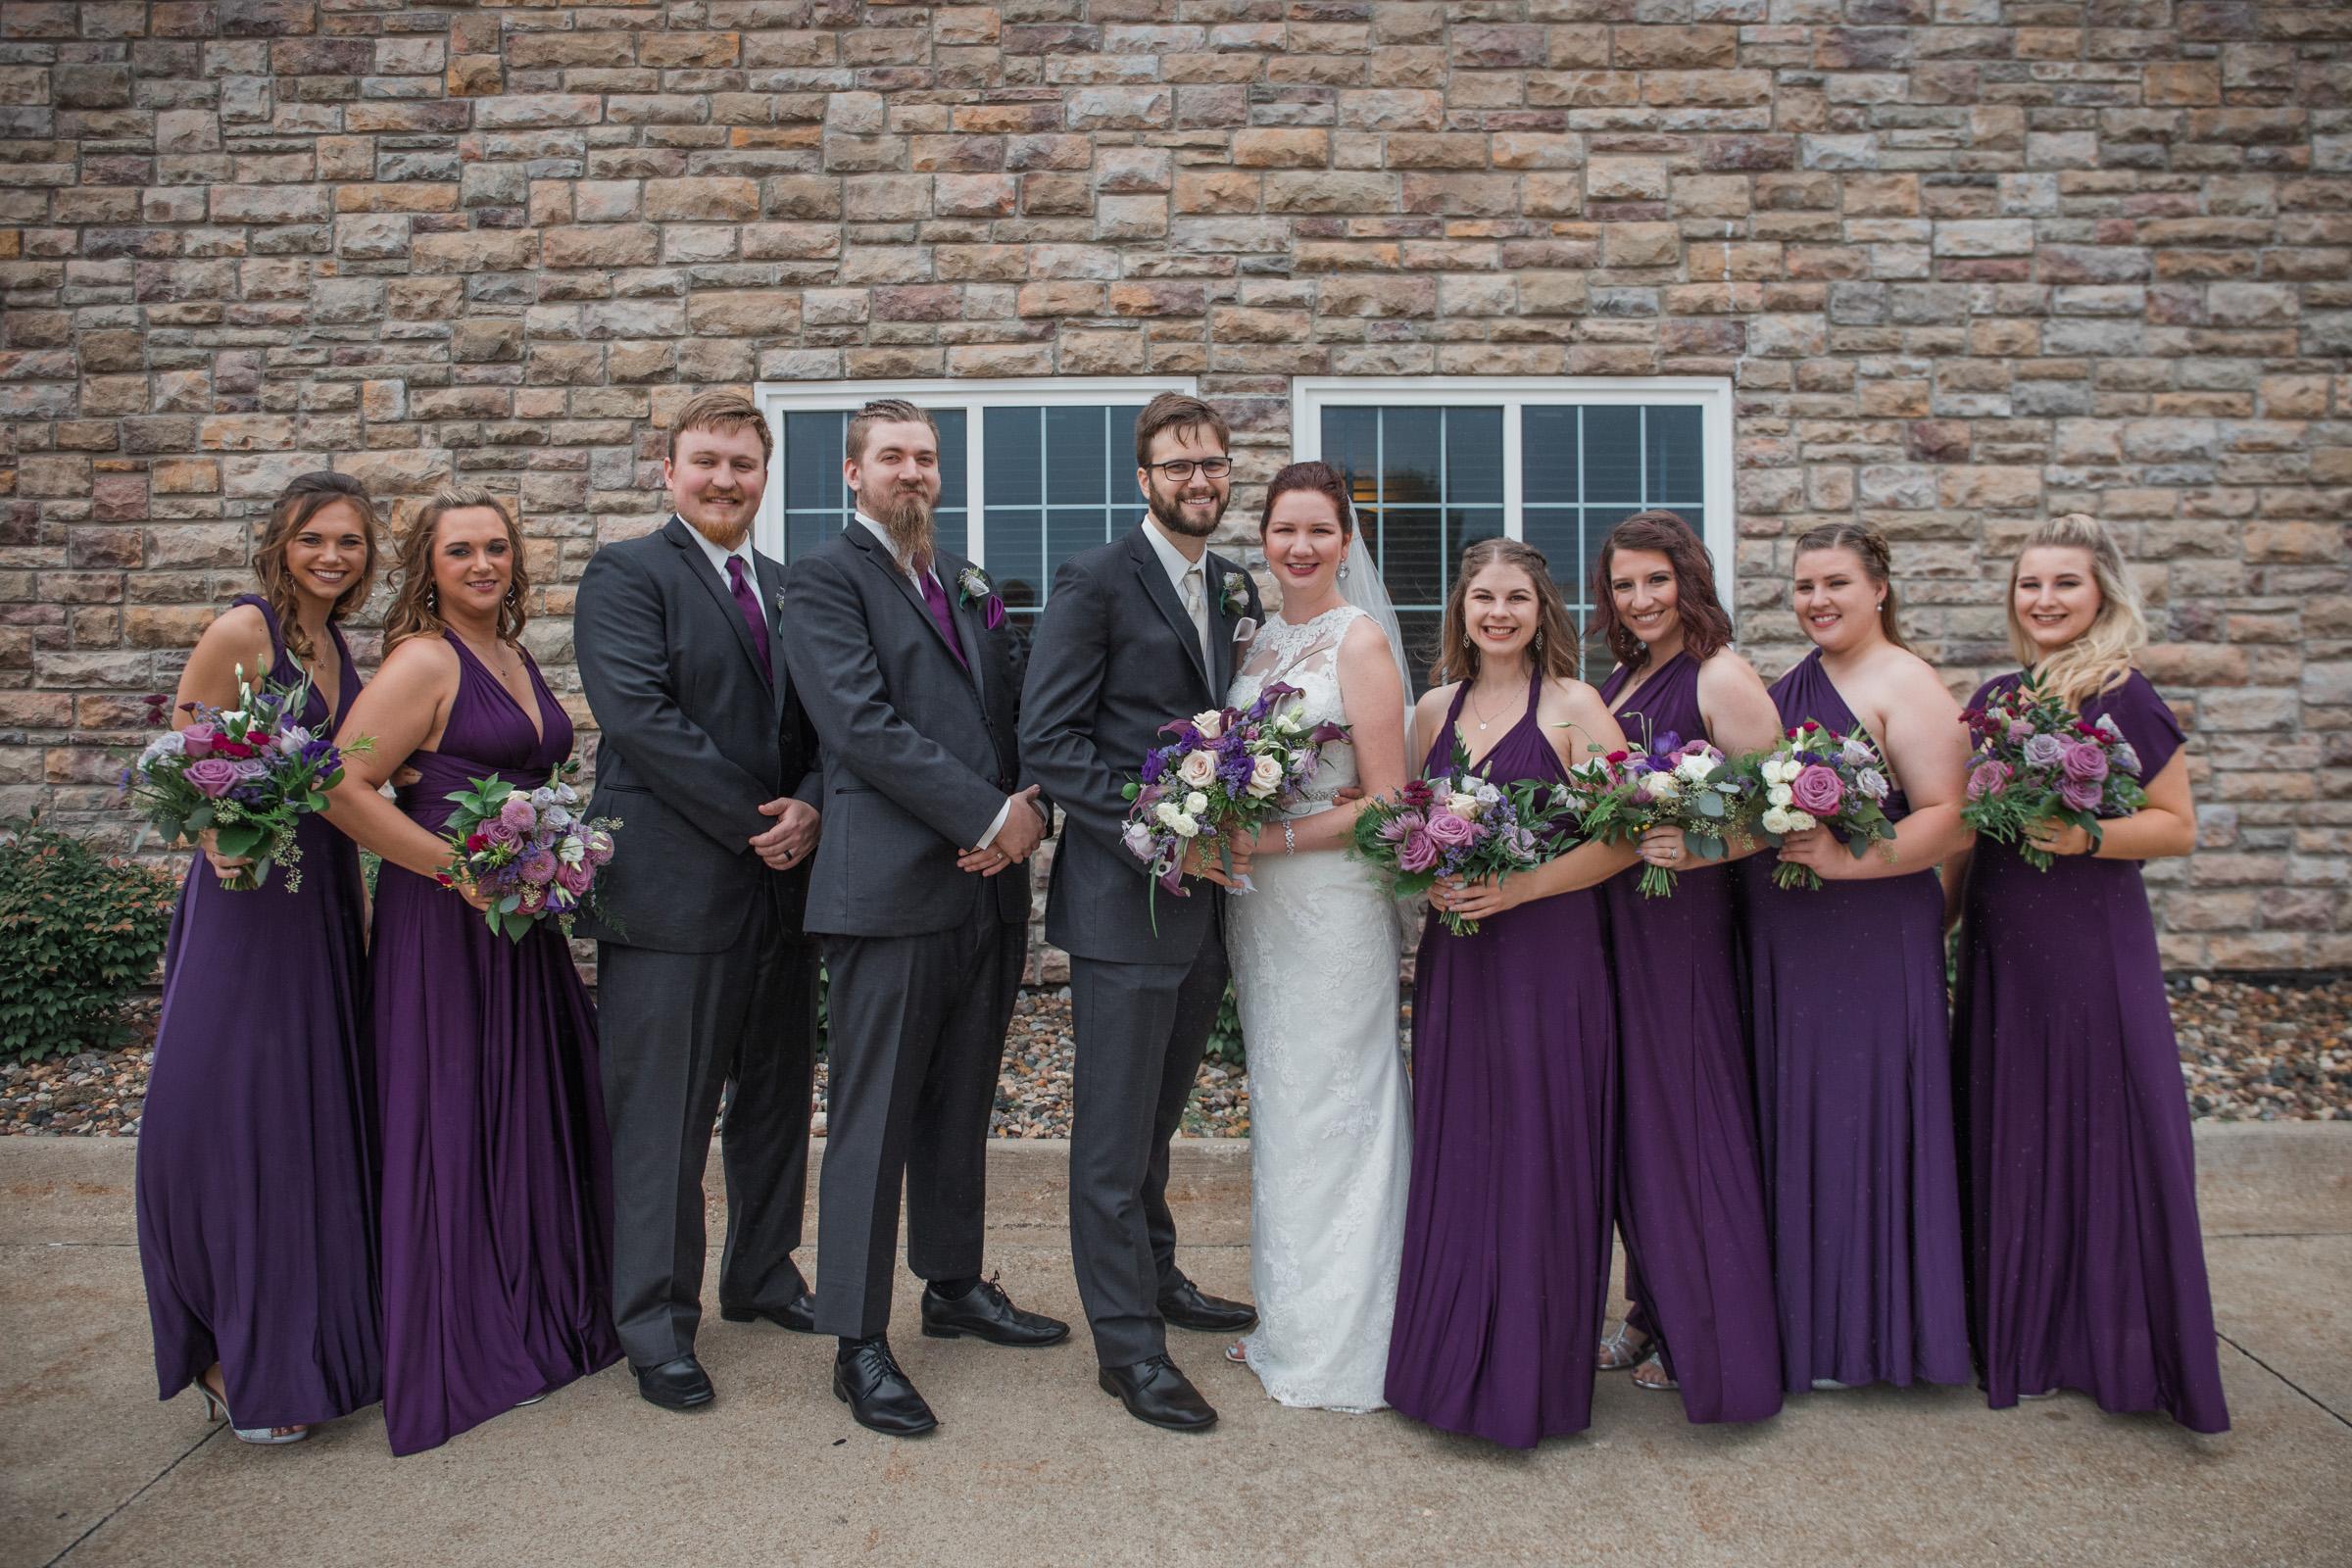 johnston_iowa_wedding_photographers-15.jpg